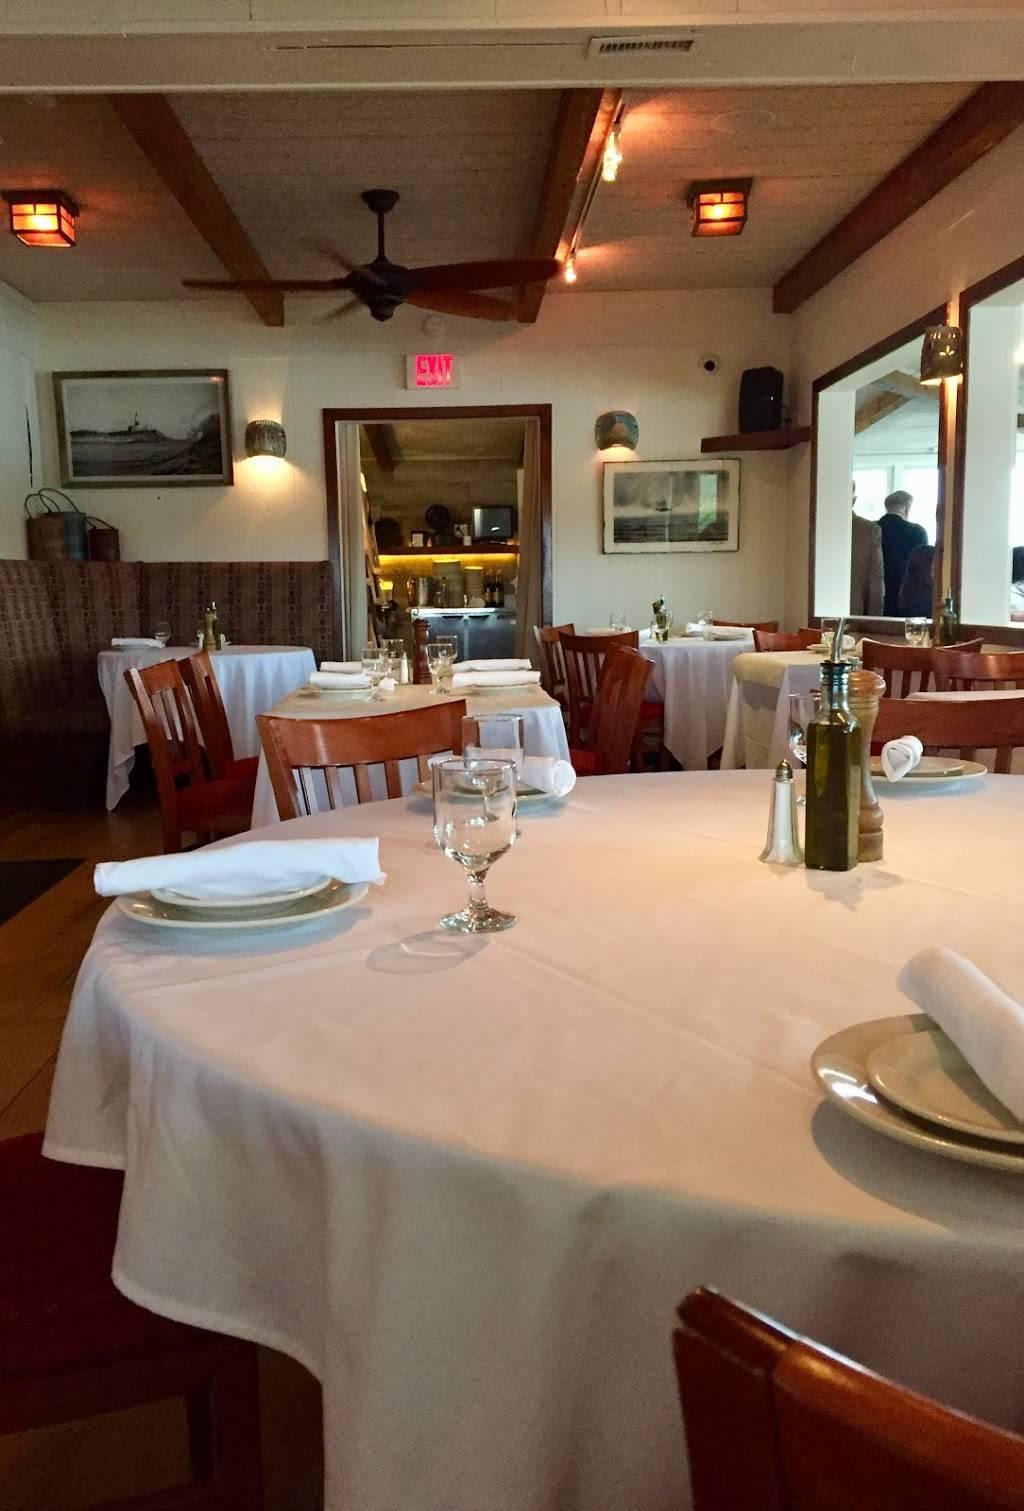 Harvest On Fort Pond | restaurant | 11 S Emery St, Montauk, NY 11954, USA | 6316685574 OR +1 631-668-5574